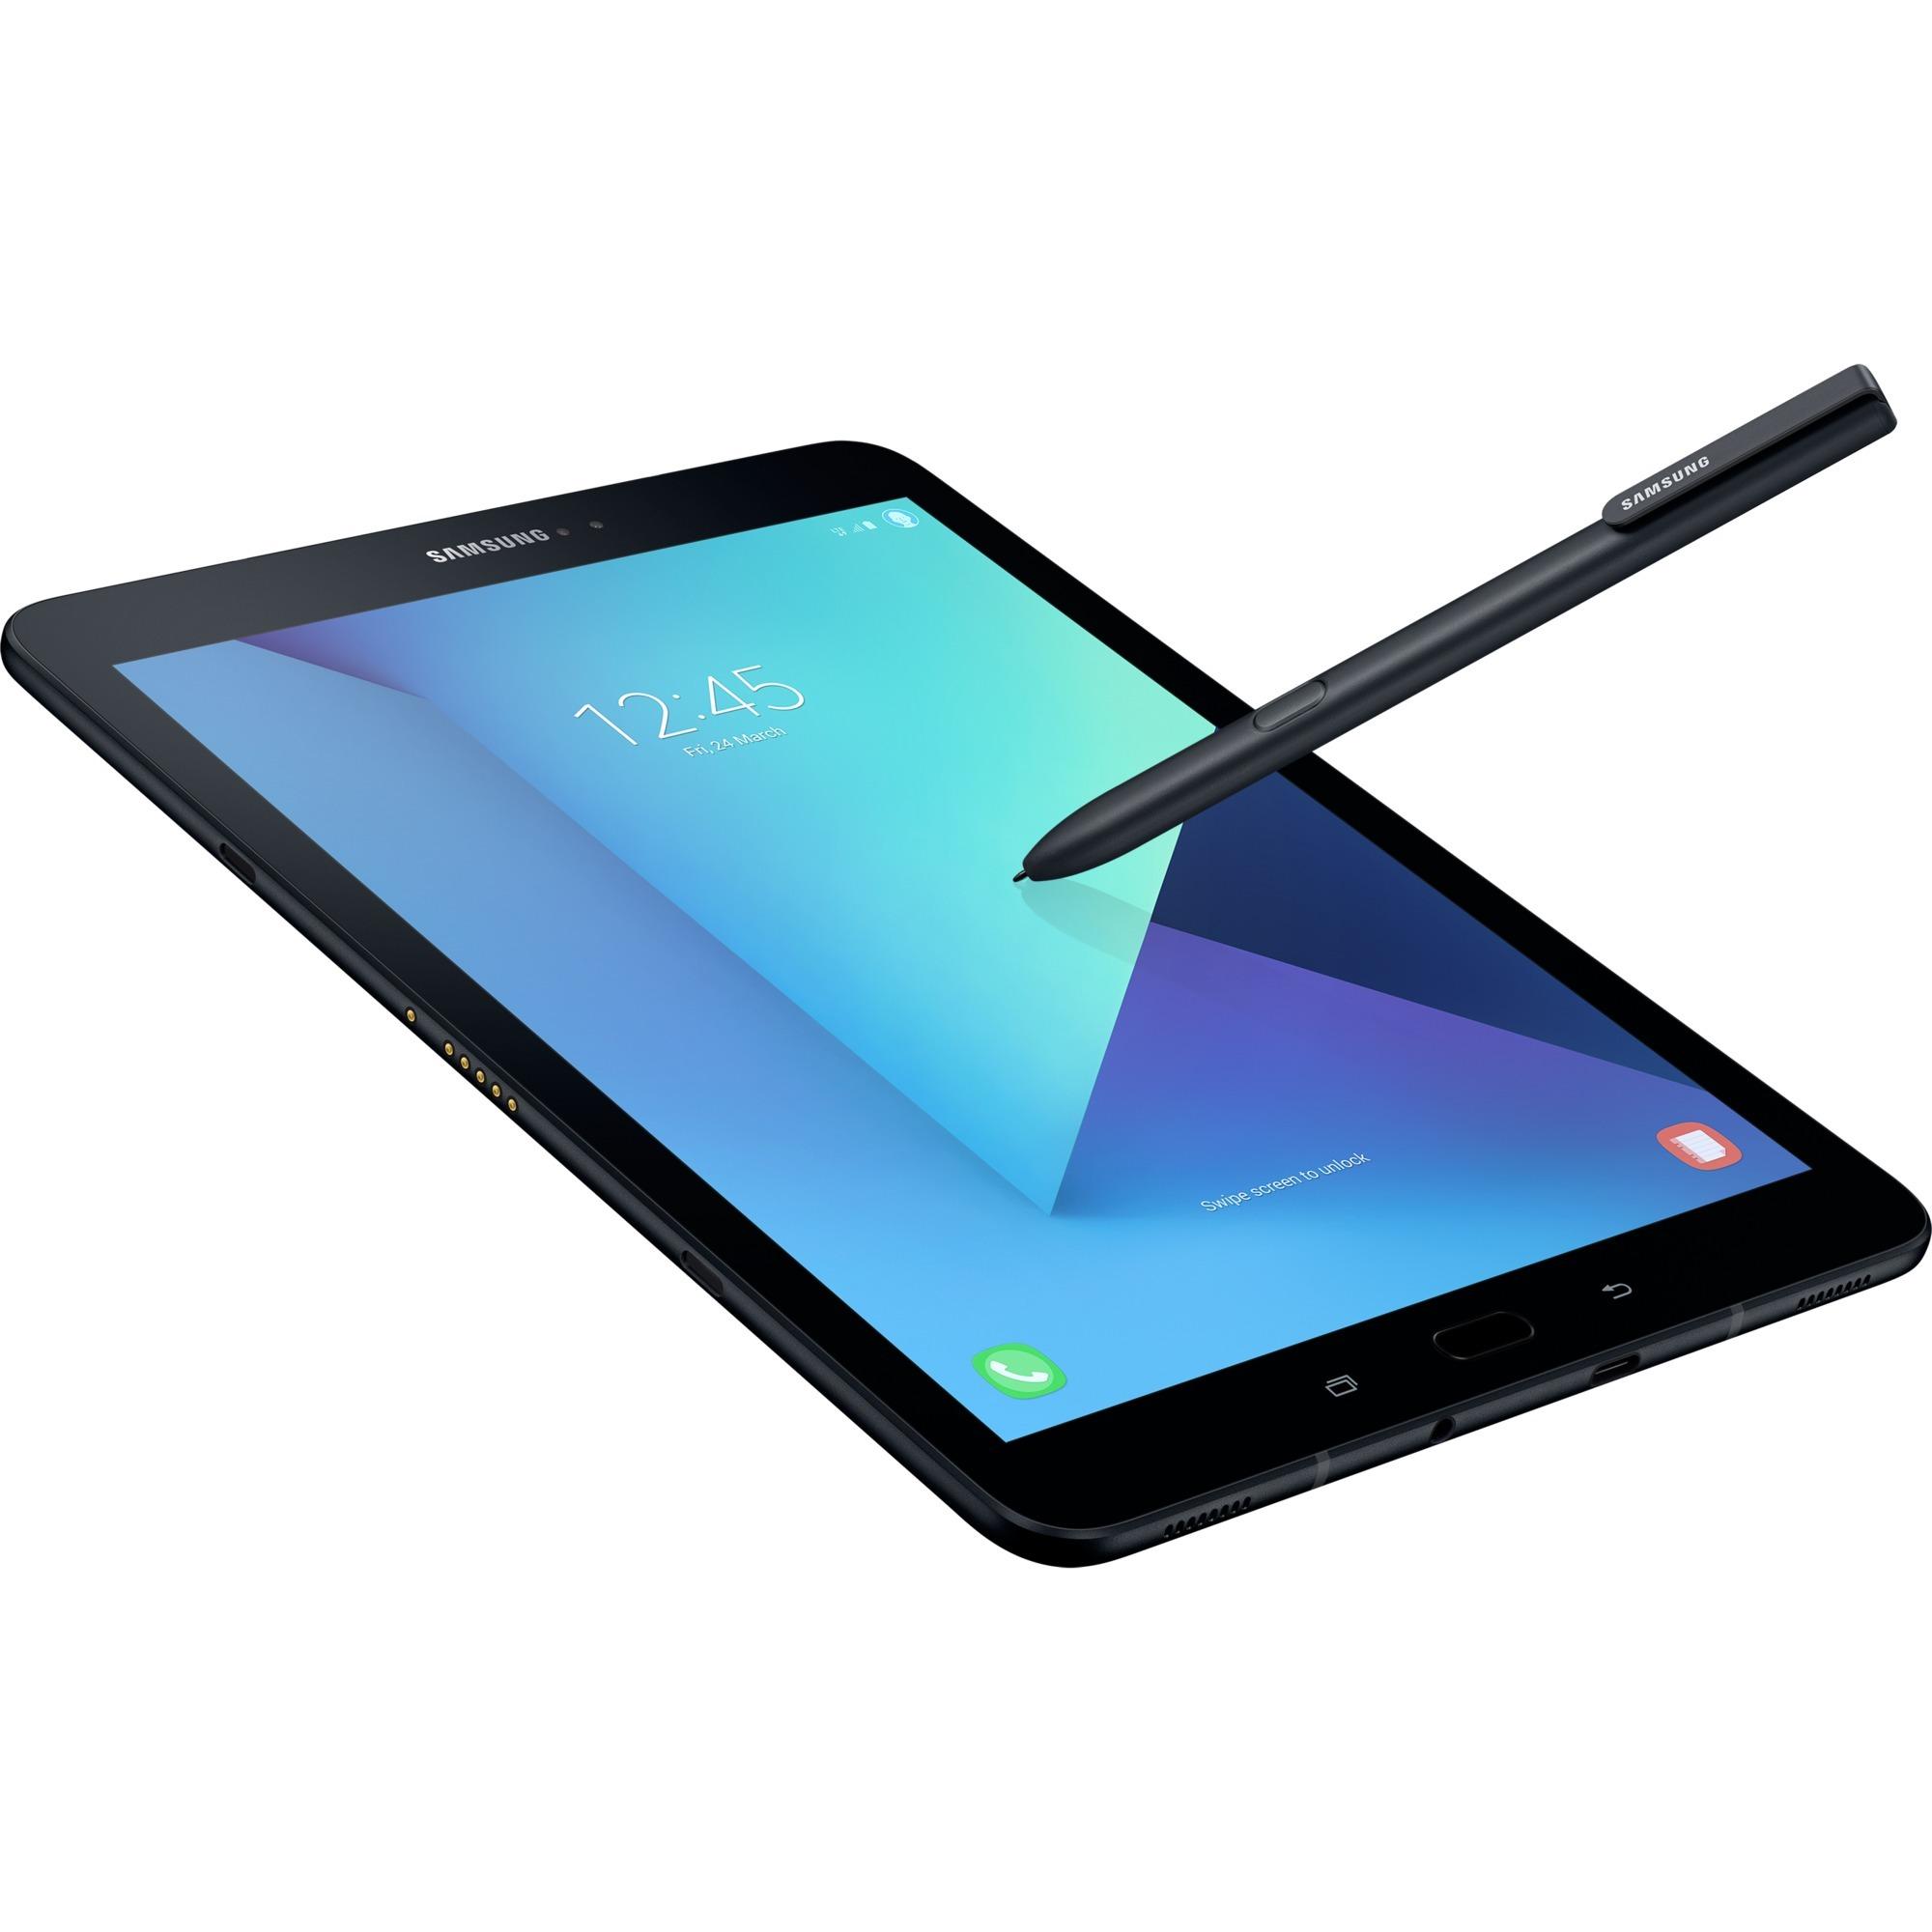 Galaxy Tab S 3 32Go 3G 4G Noir tablette, Tablette PC